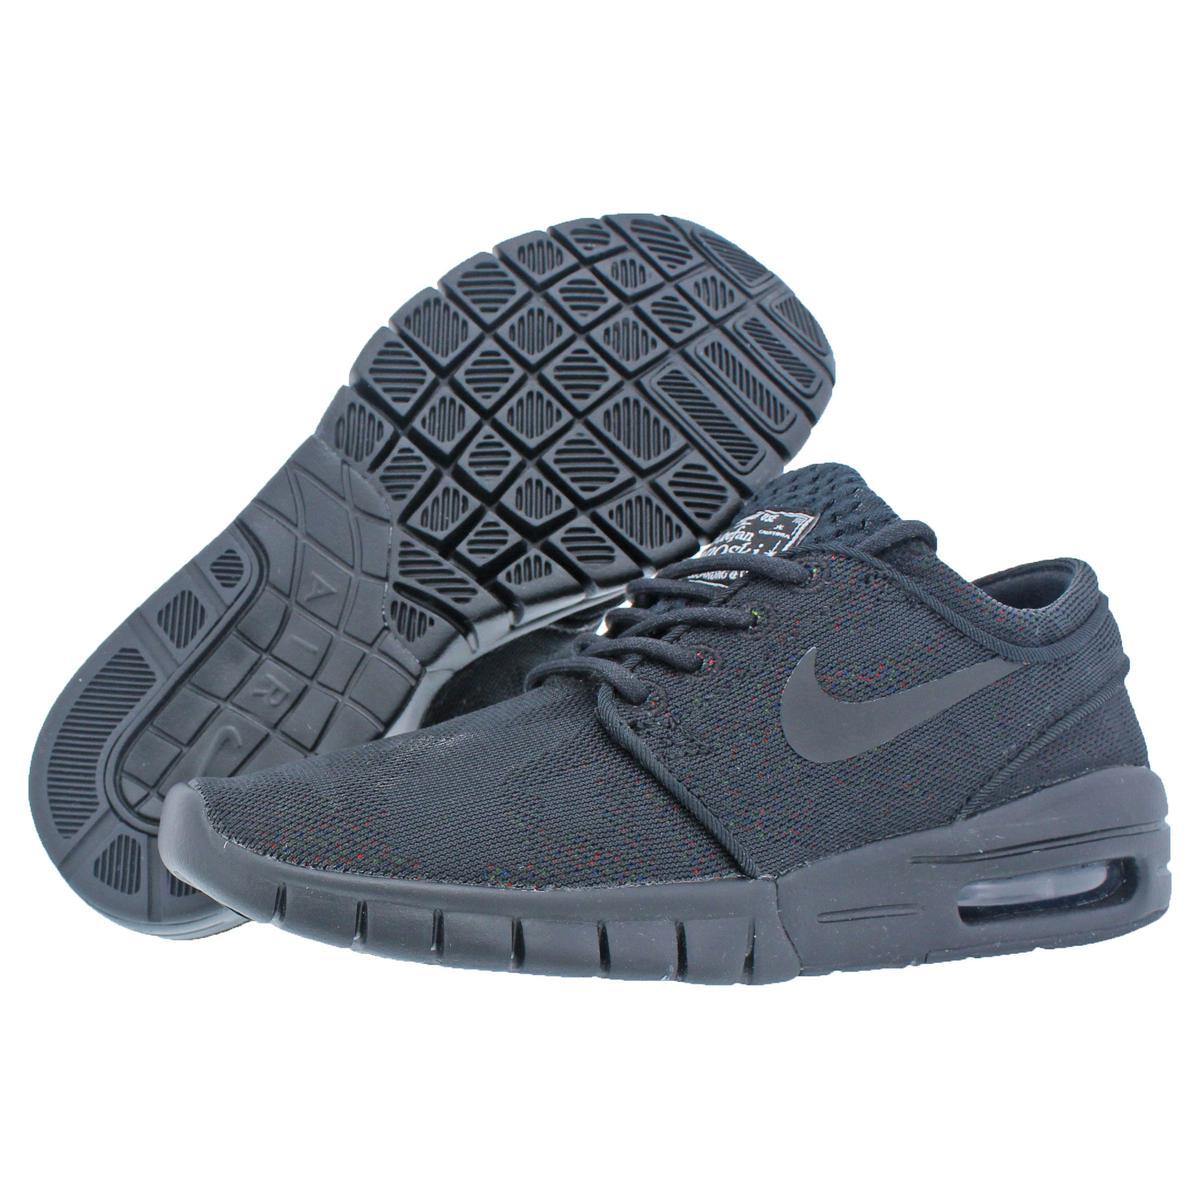 Nike Hommes Stefan Janoski Max Skate PRM Trainer Nike Air Skate Max Chaussures Baskets BHFO 1284 b472f1